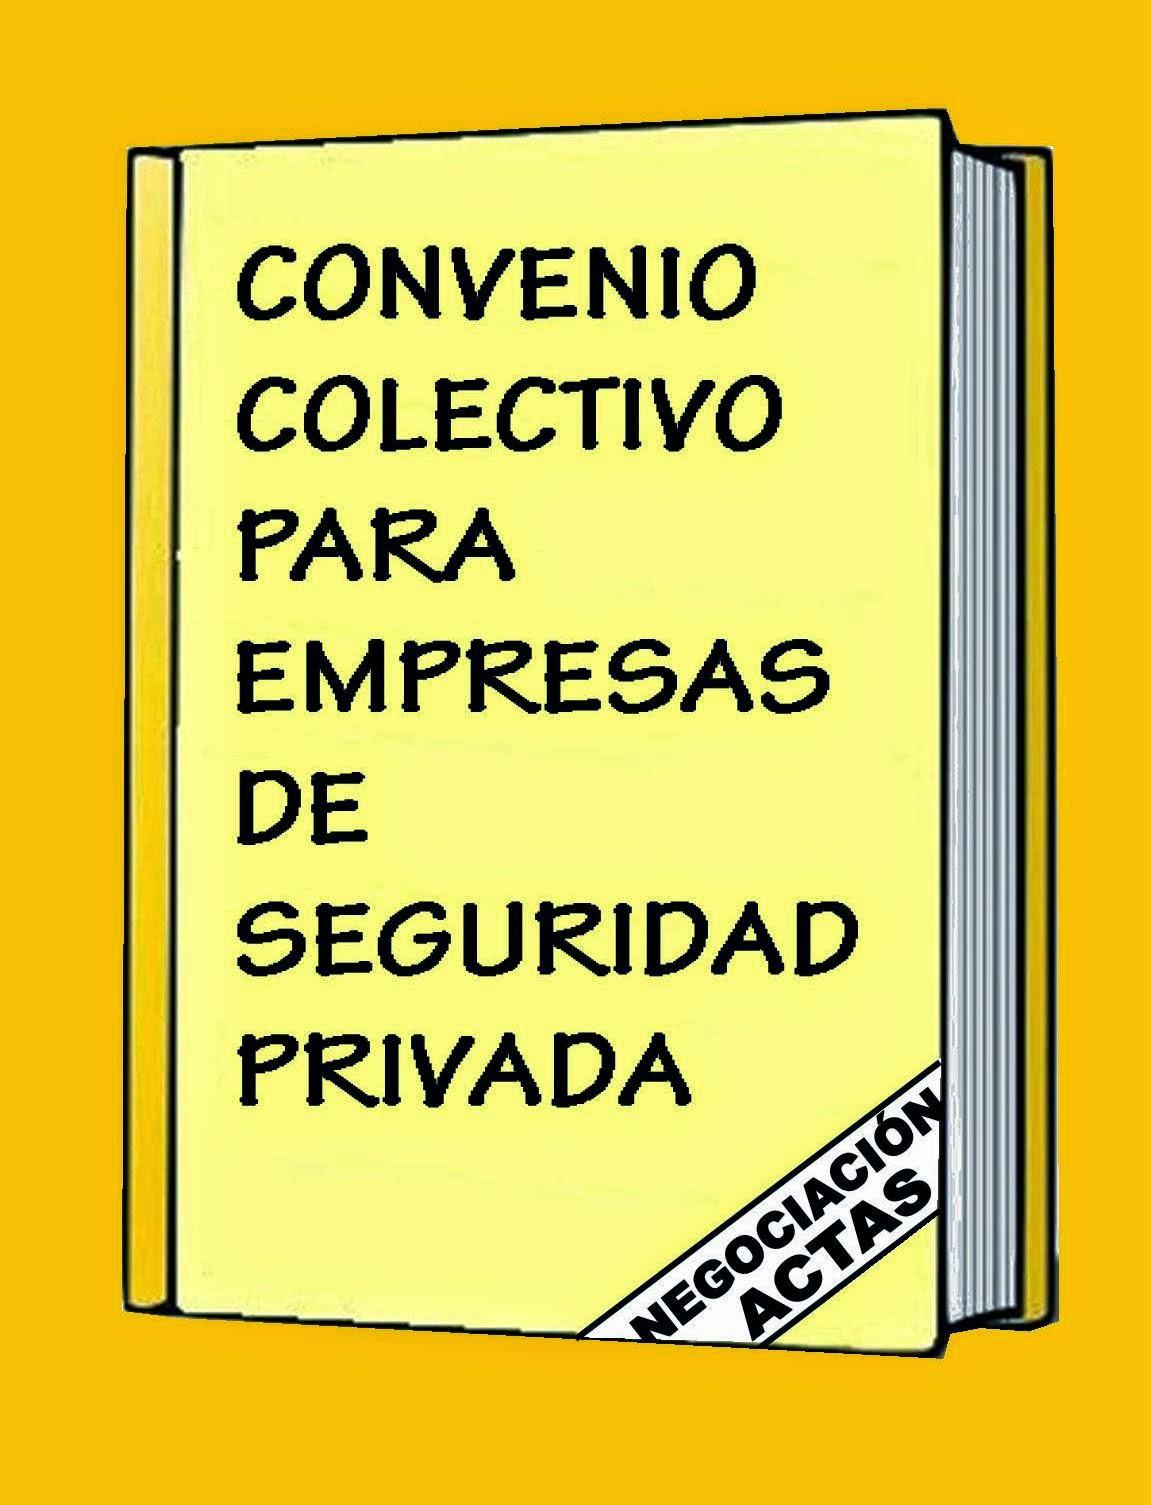 Negociación Convenio Colectivo